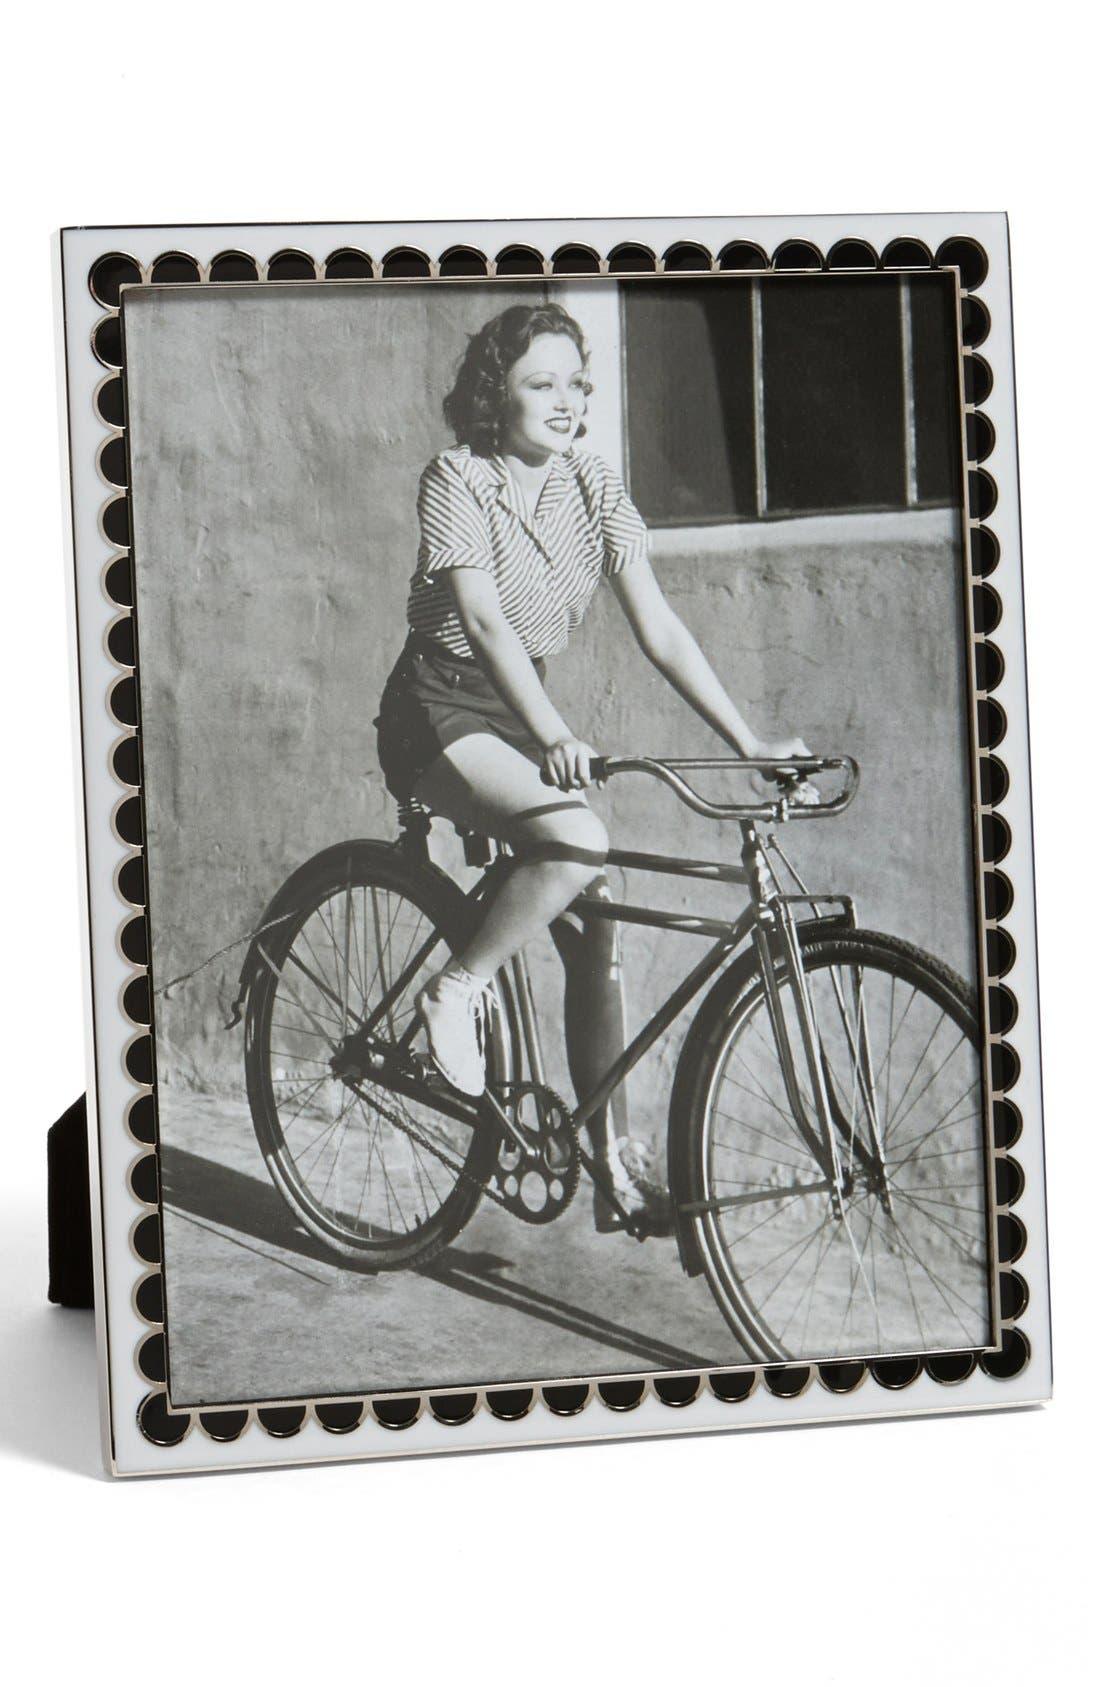 Alternate Image 1 Selected - kate spade new york 'pierrepont place - half dot' frame (8x10)